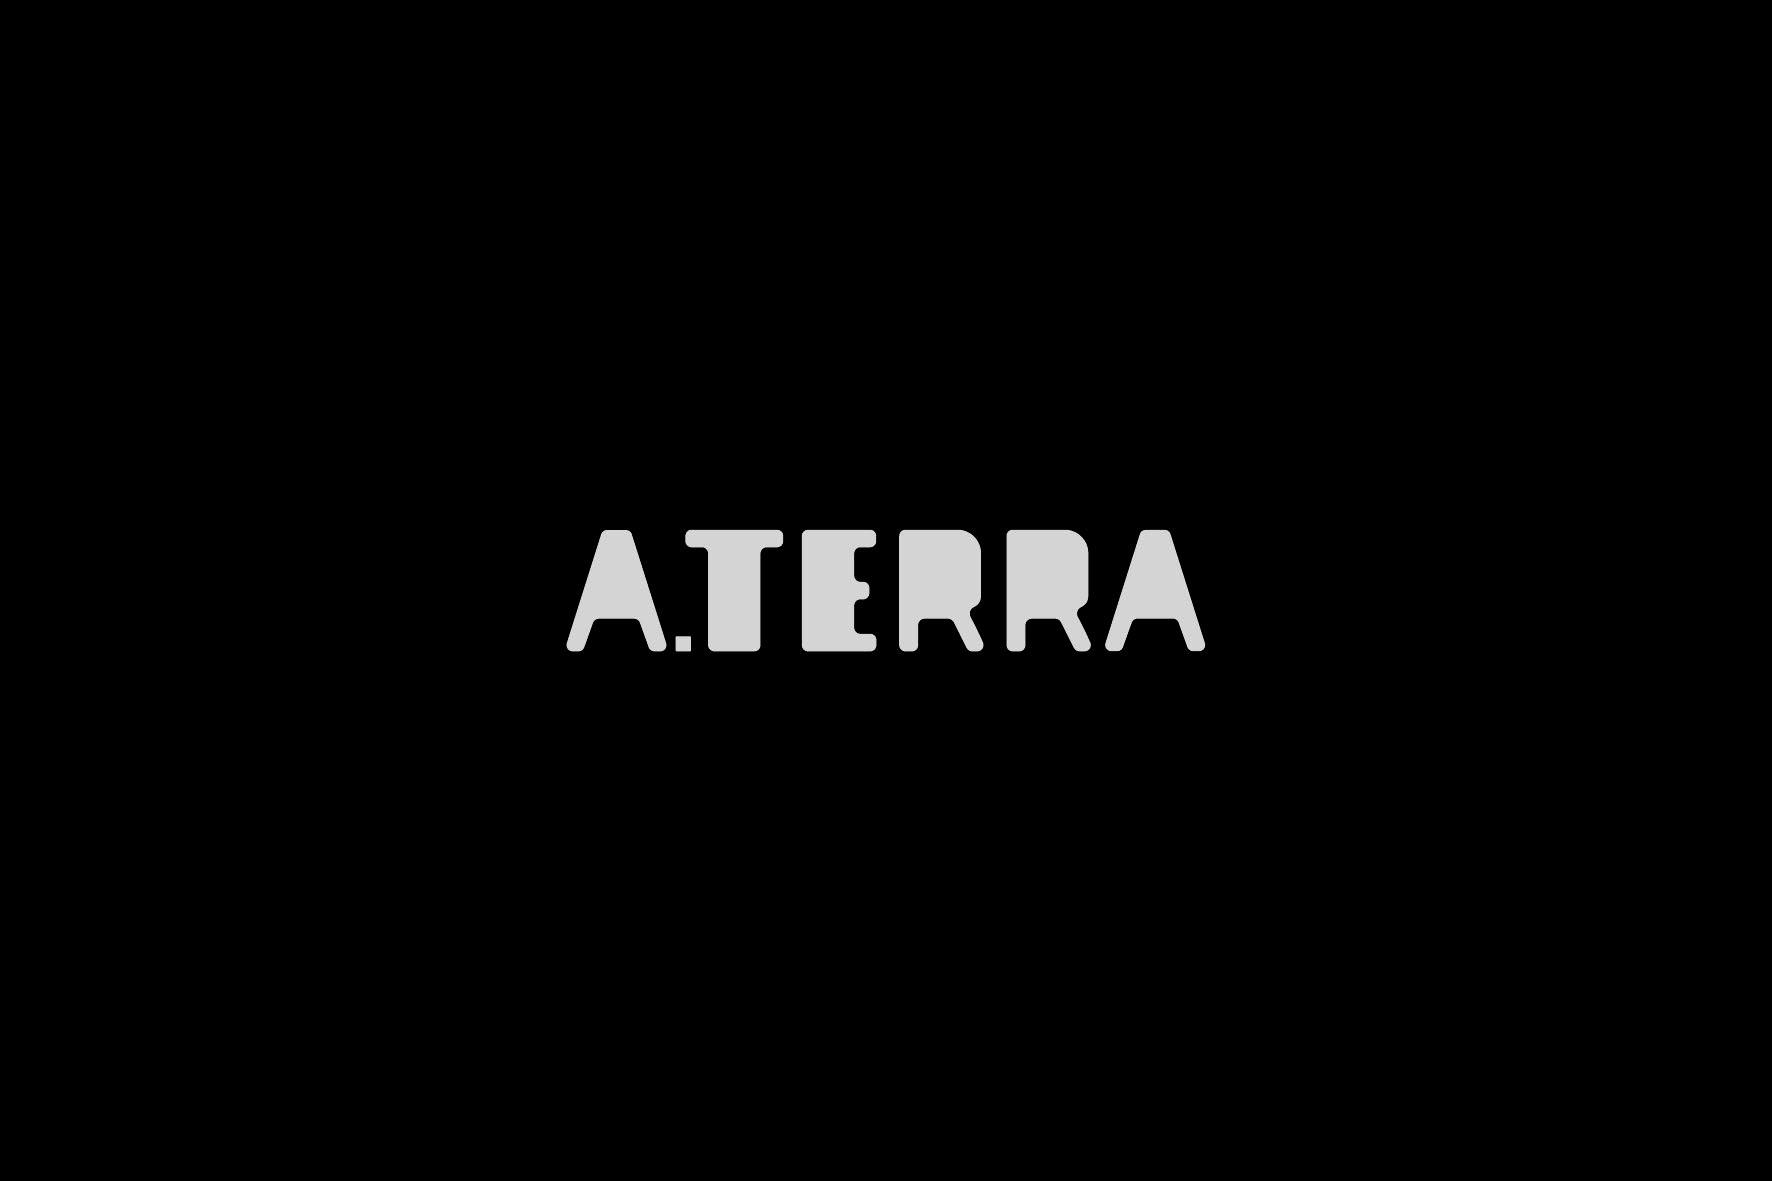 atelier790_aterra